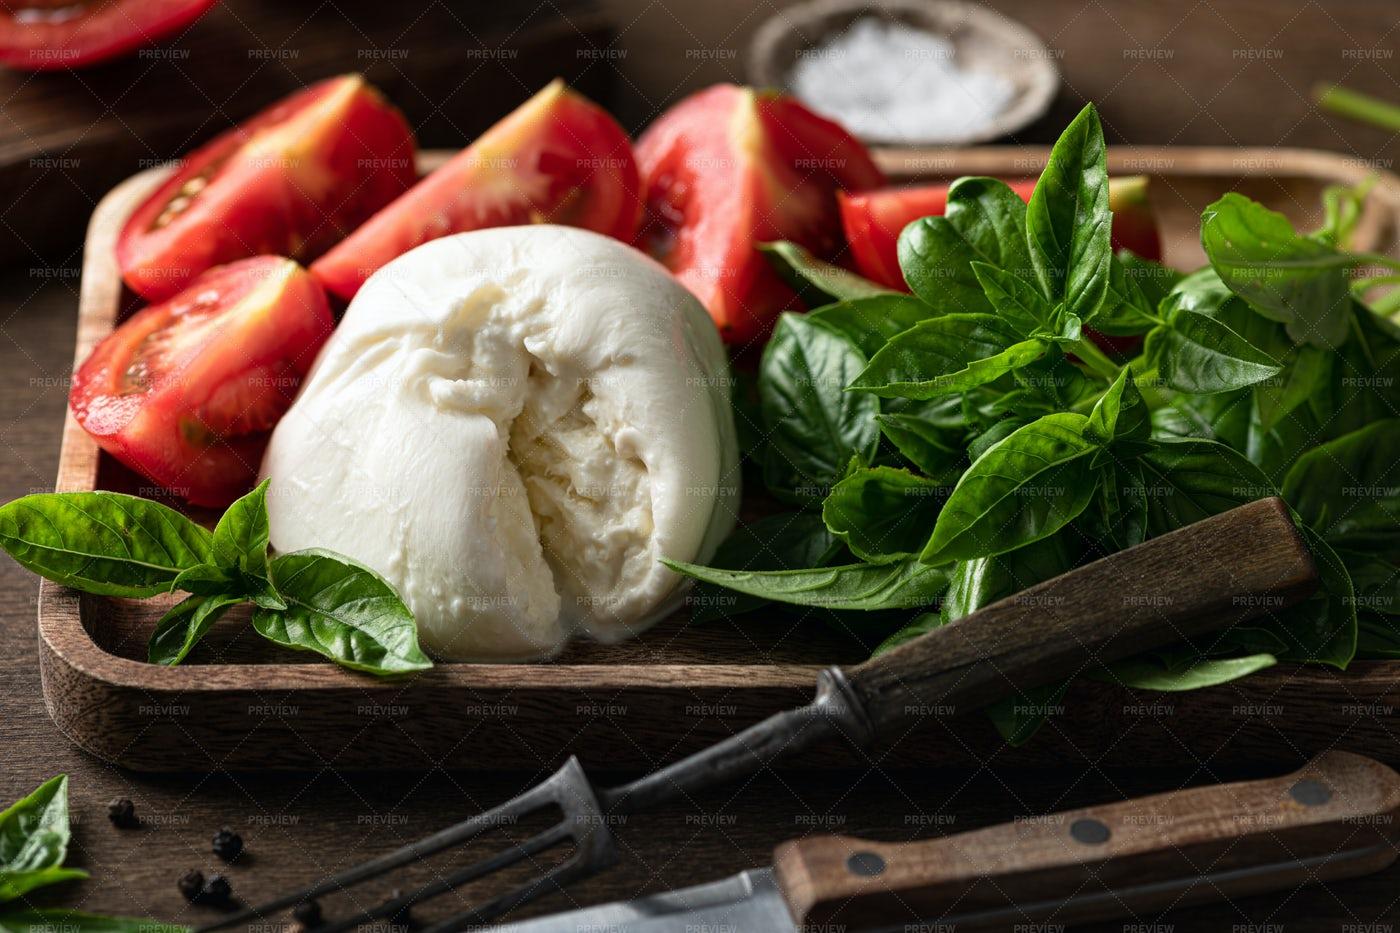 Burrata Cheese And Tomatoes: Stock Photos